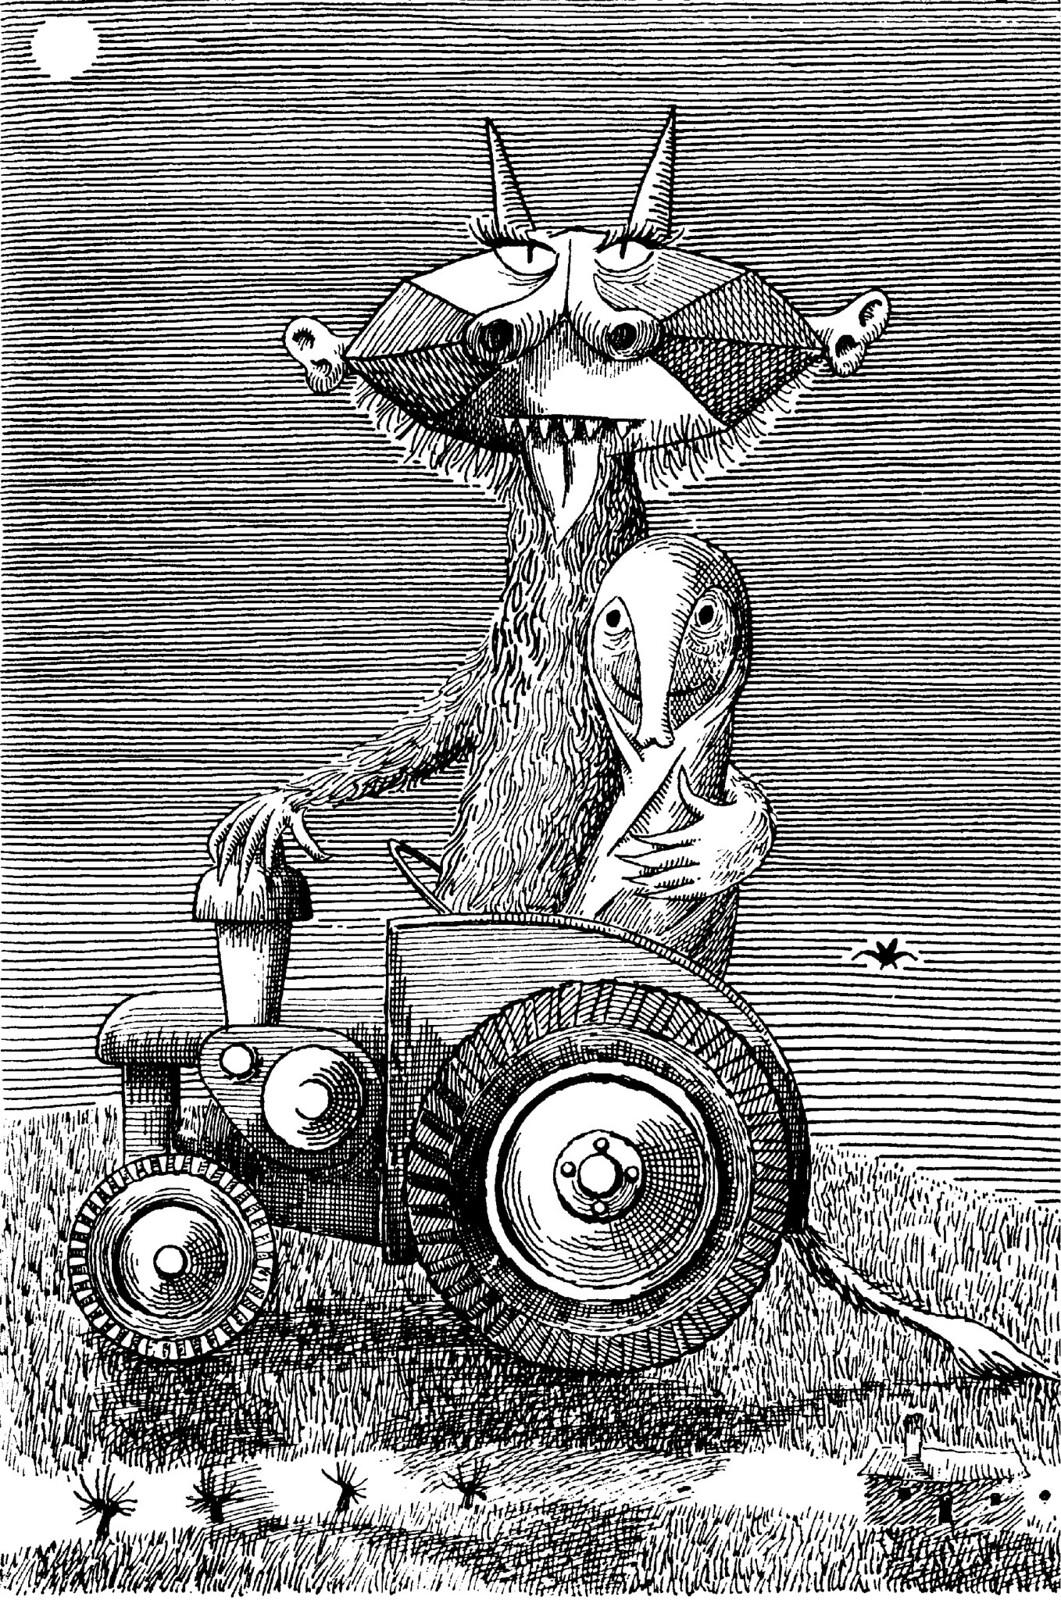 Daniel Mróz - Artwork 1